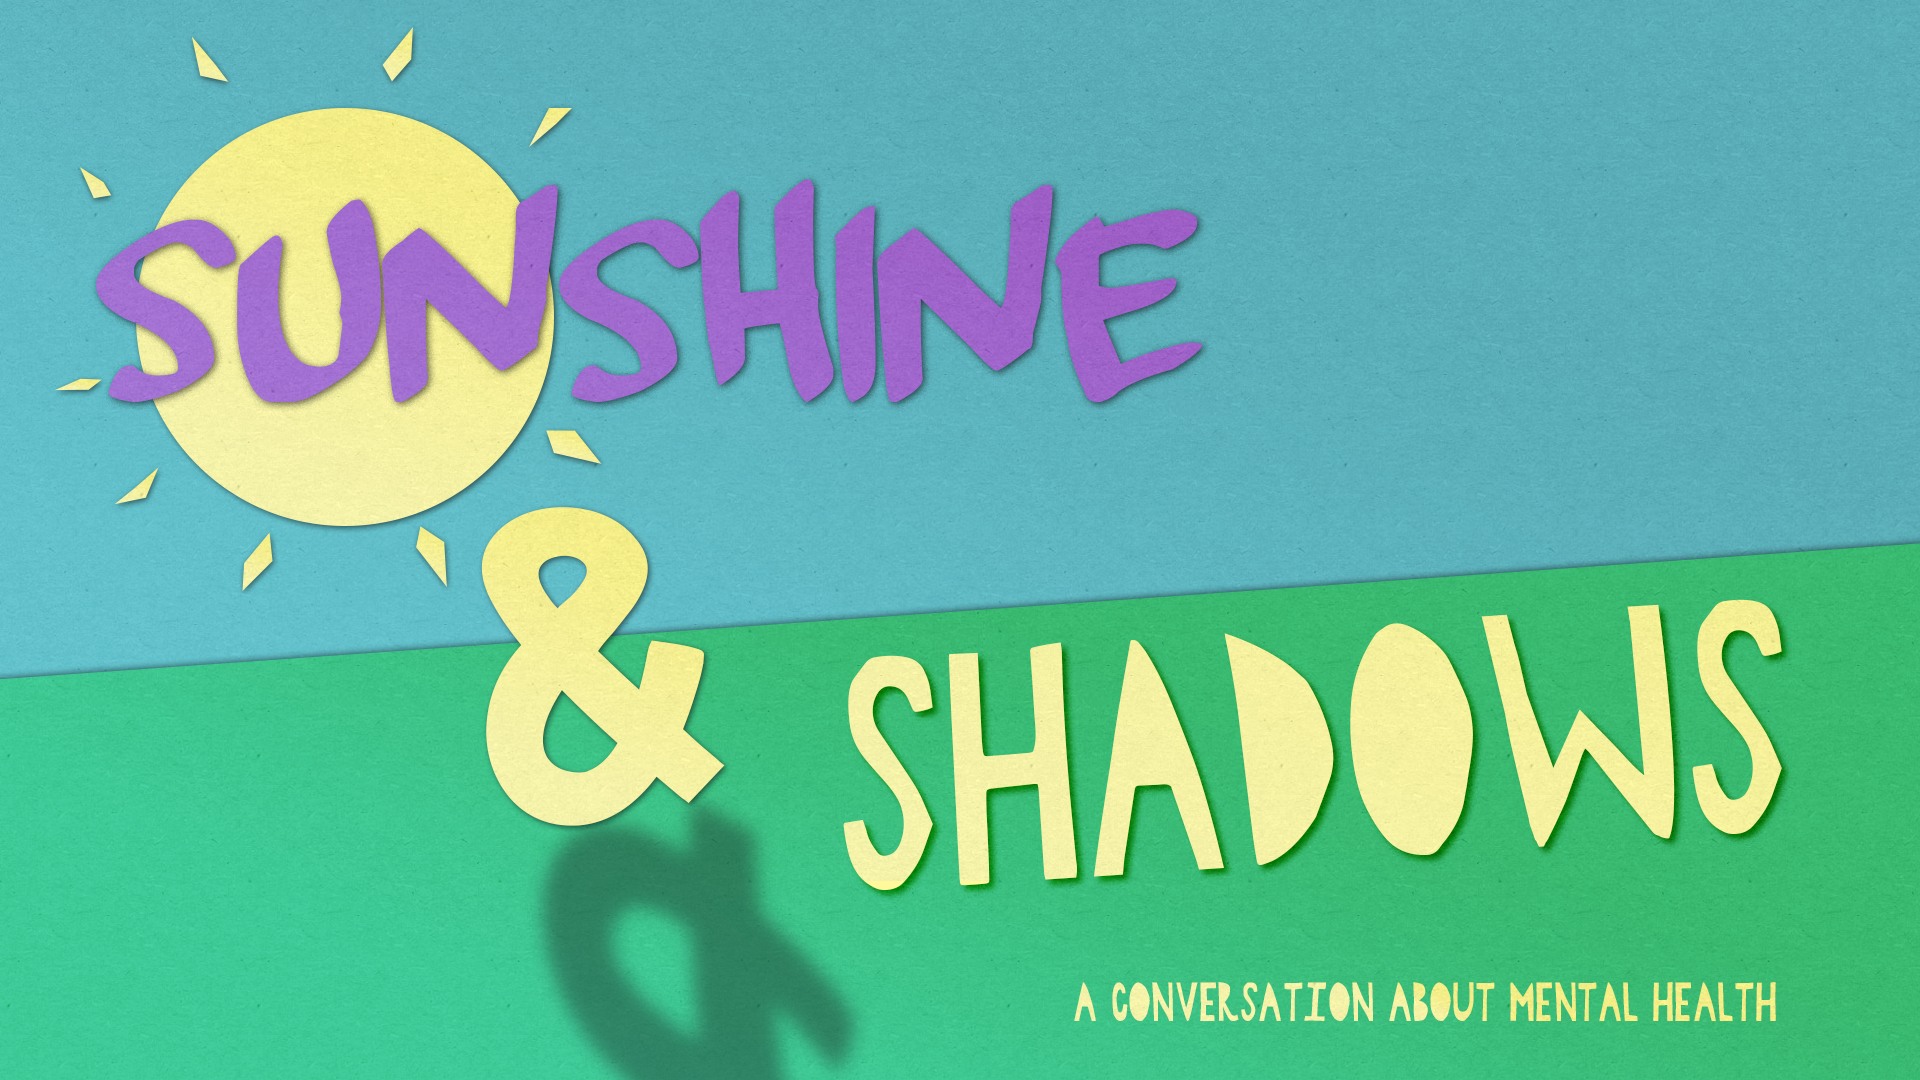 Sunshine&Shadows+Title+16x9.png